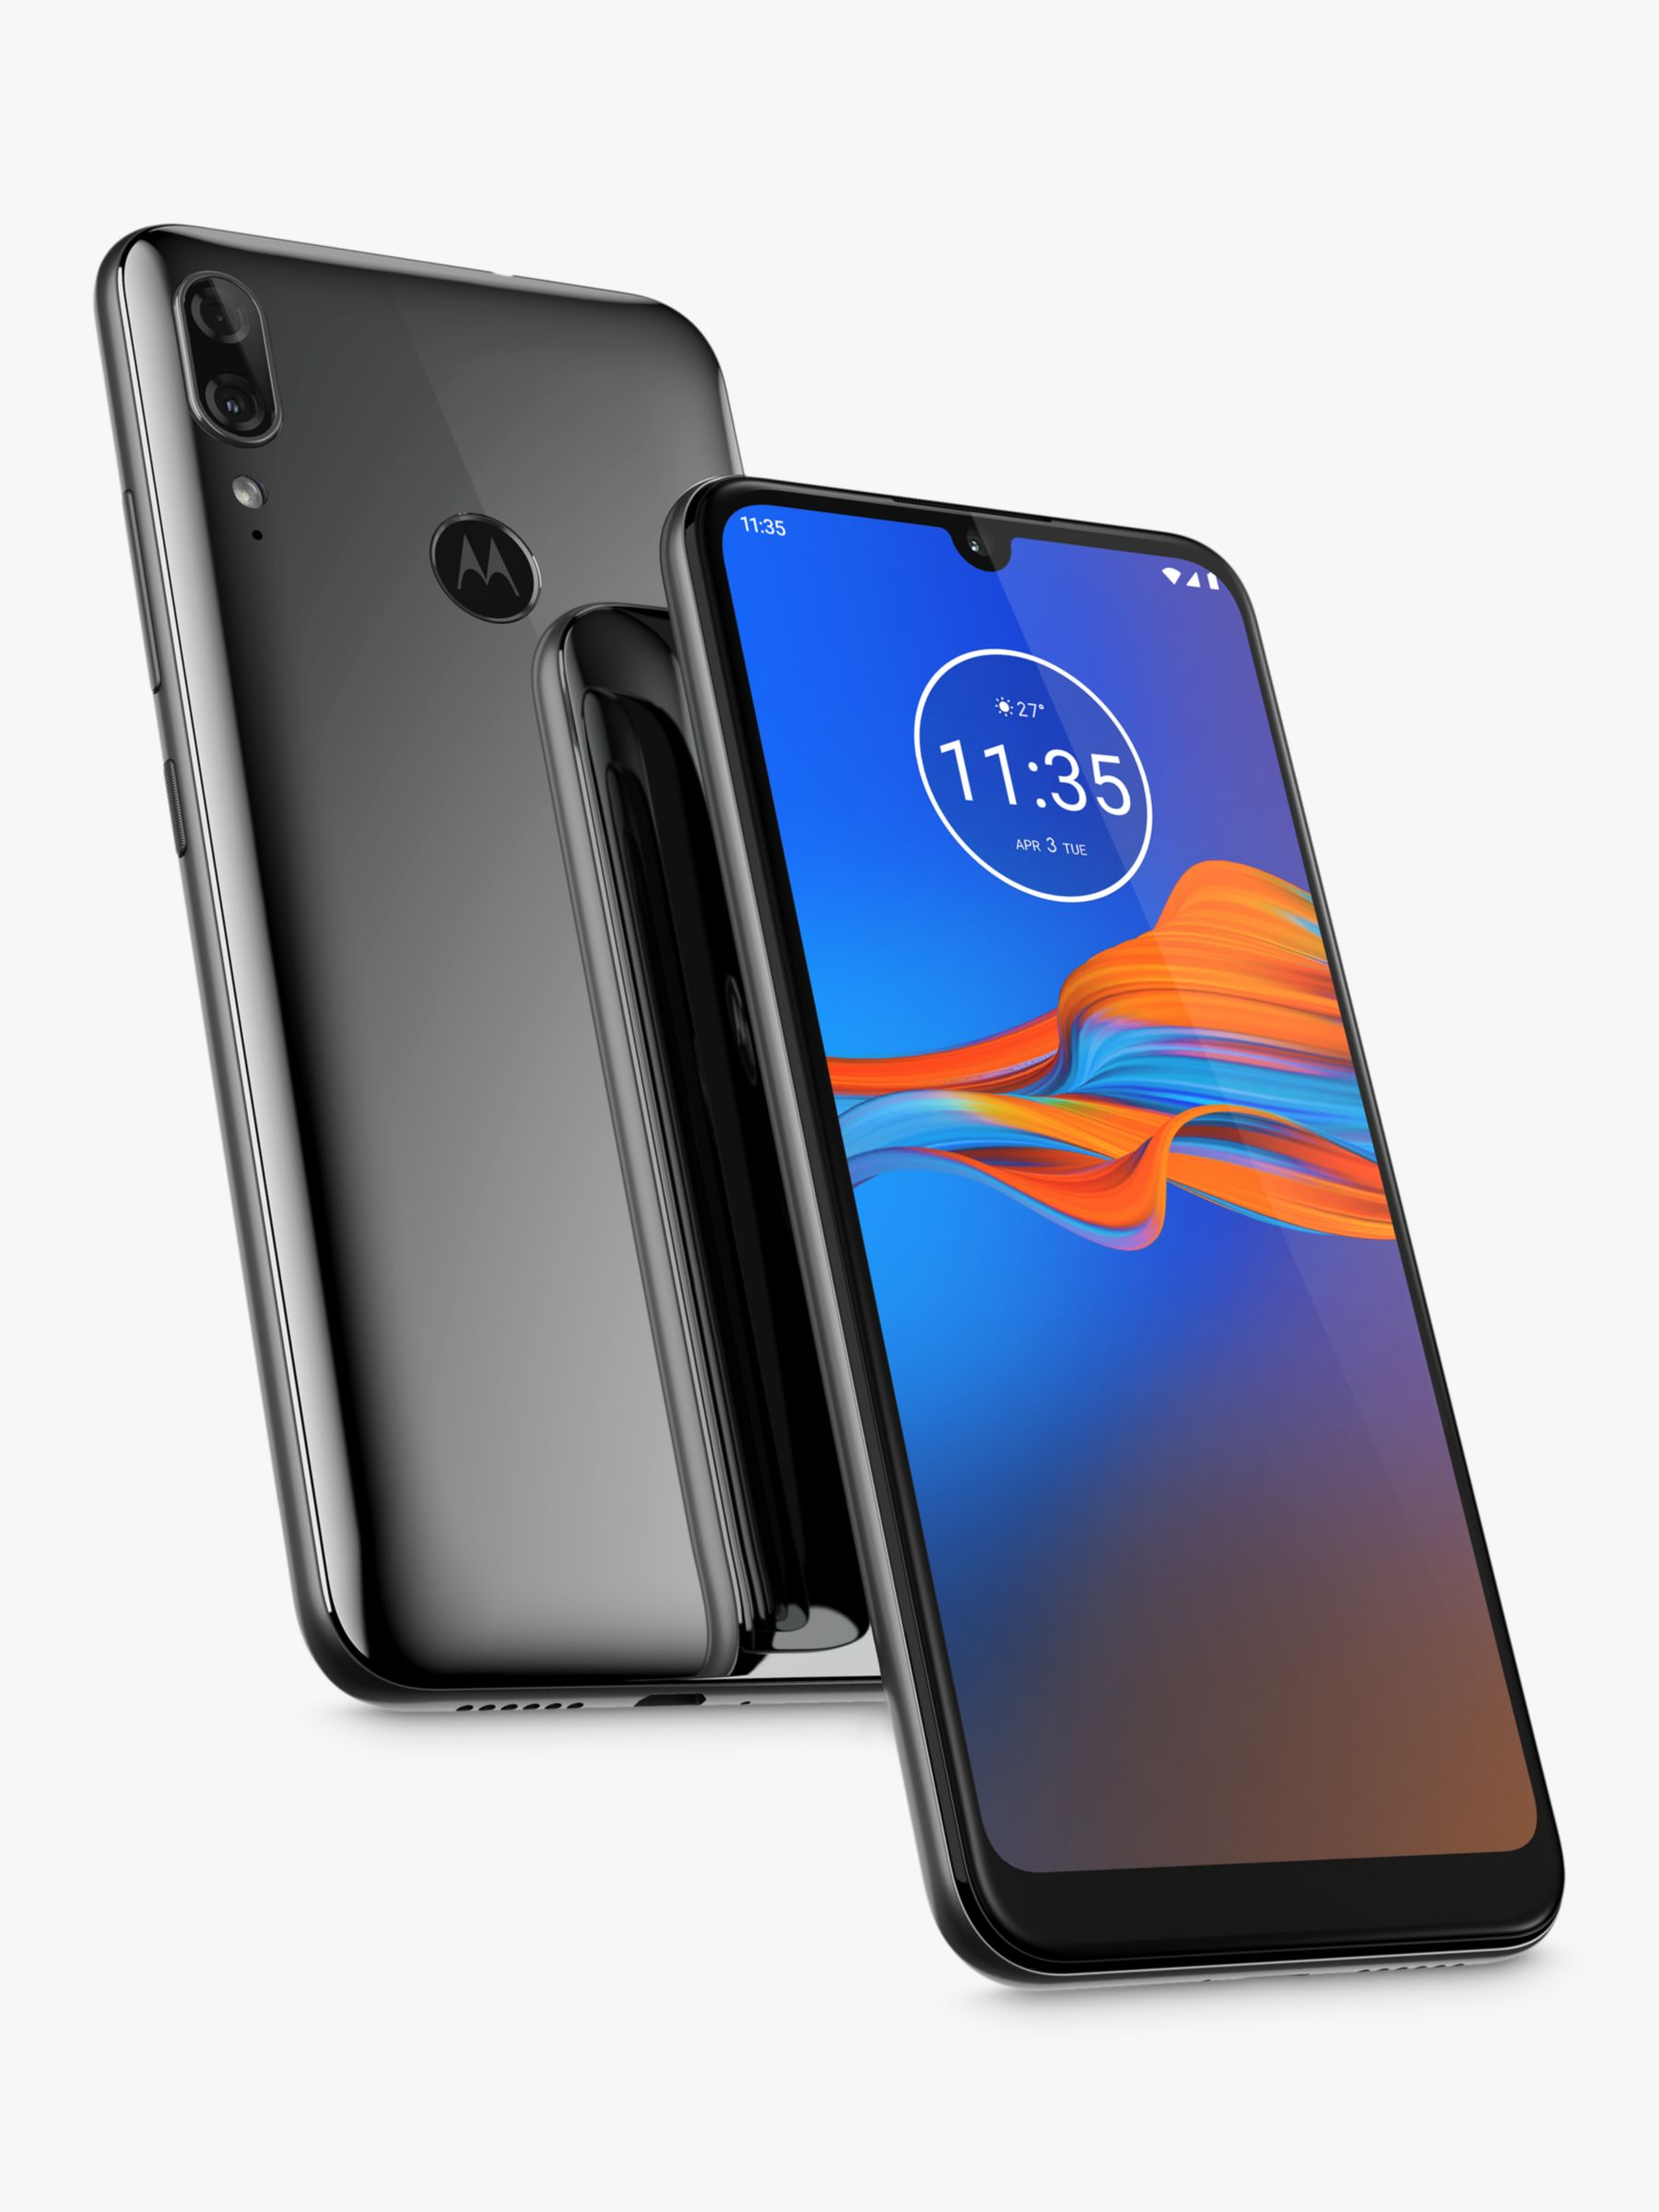 Motorola Motorola E6 Plus Smartphone, Android, 6.1, 4G LTE, SIM Free, 32GB